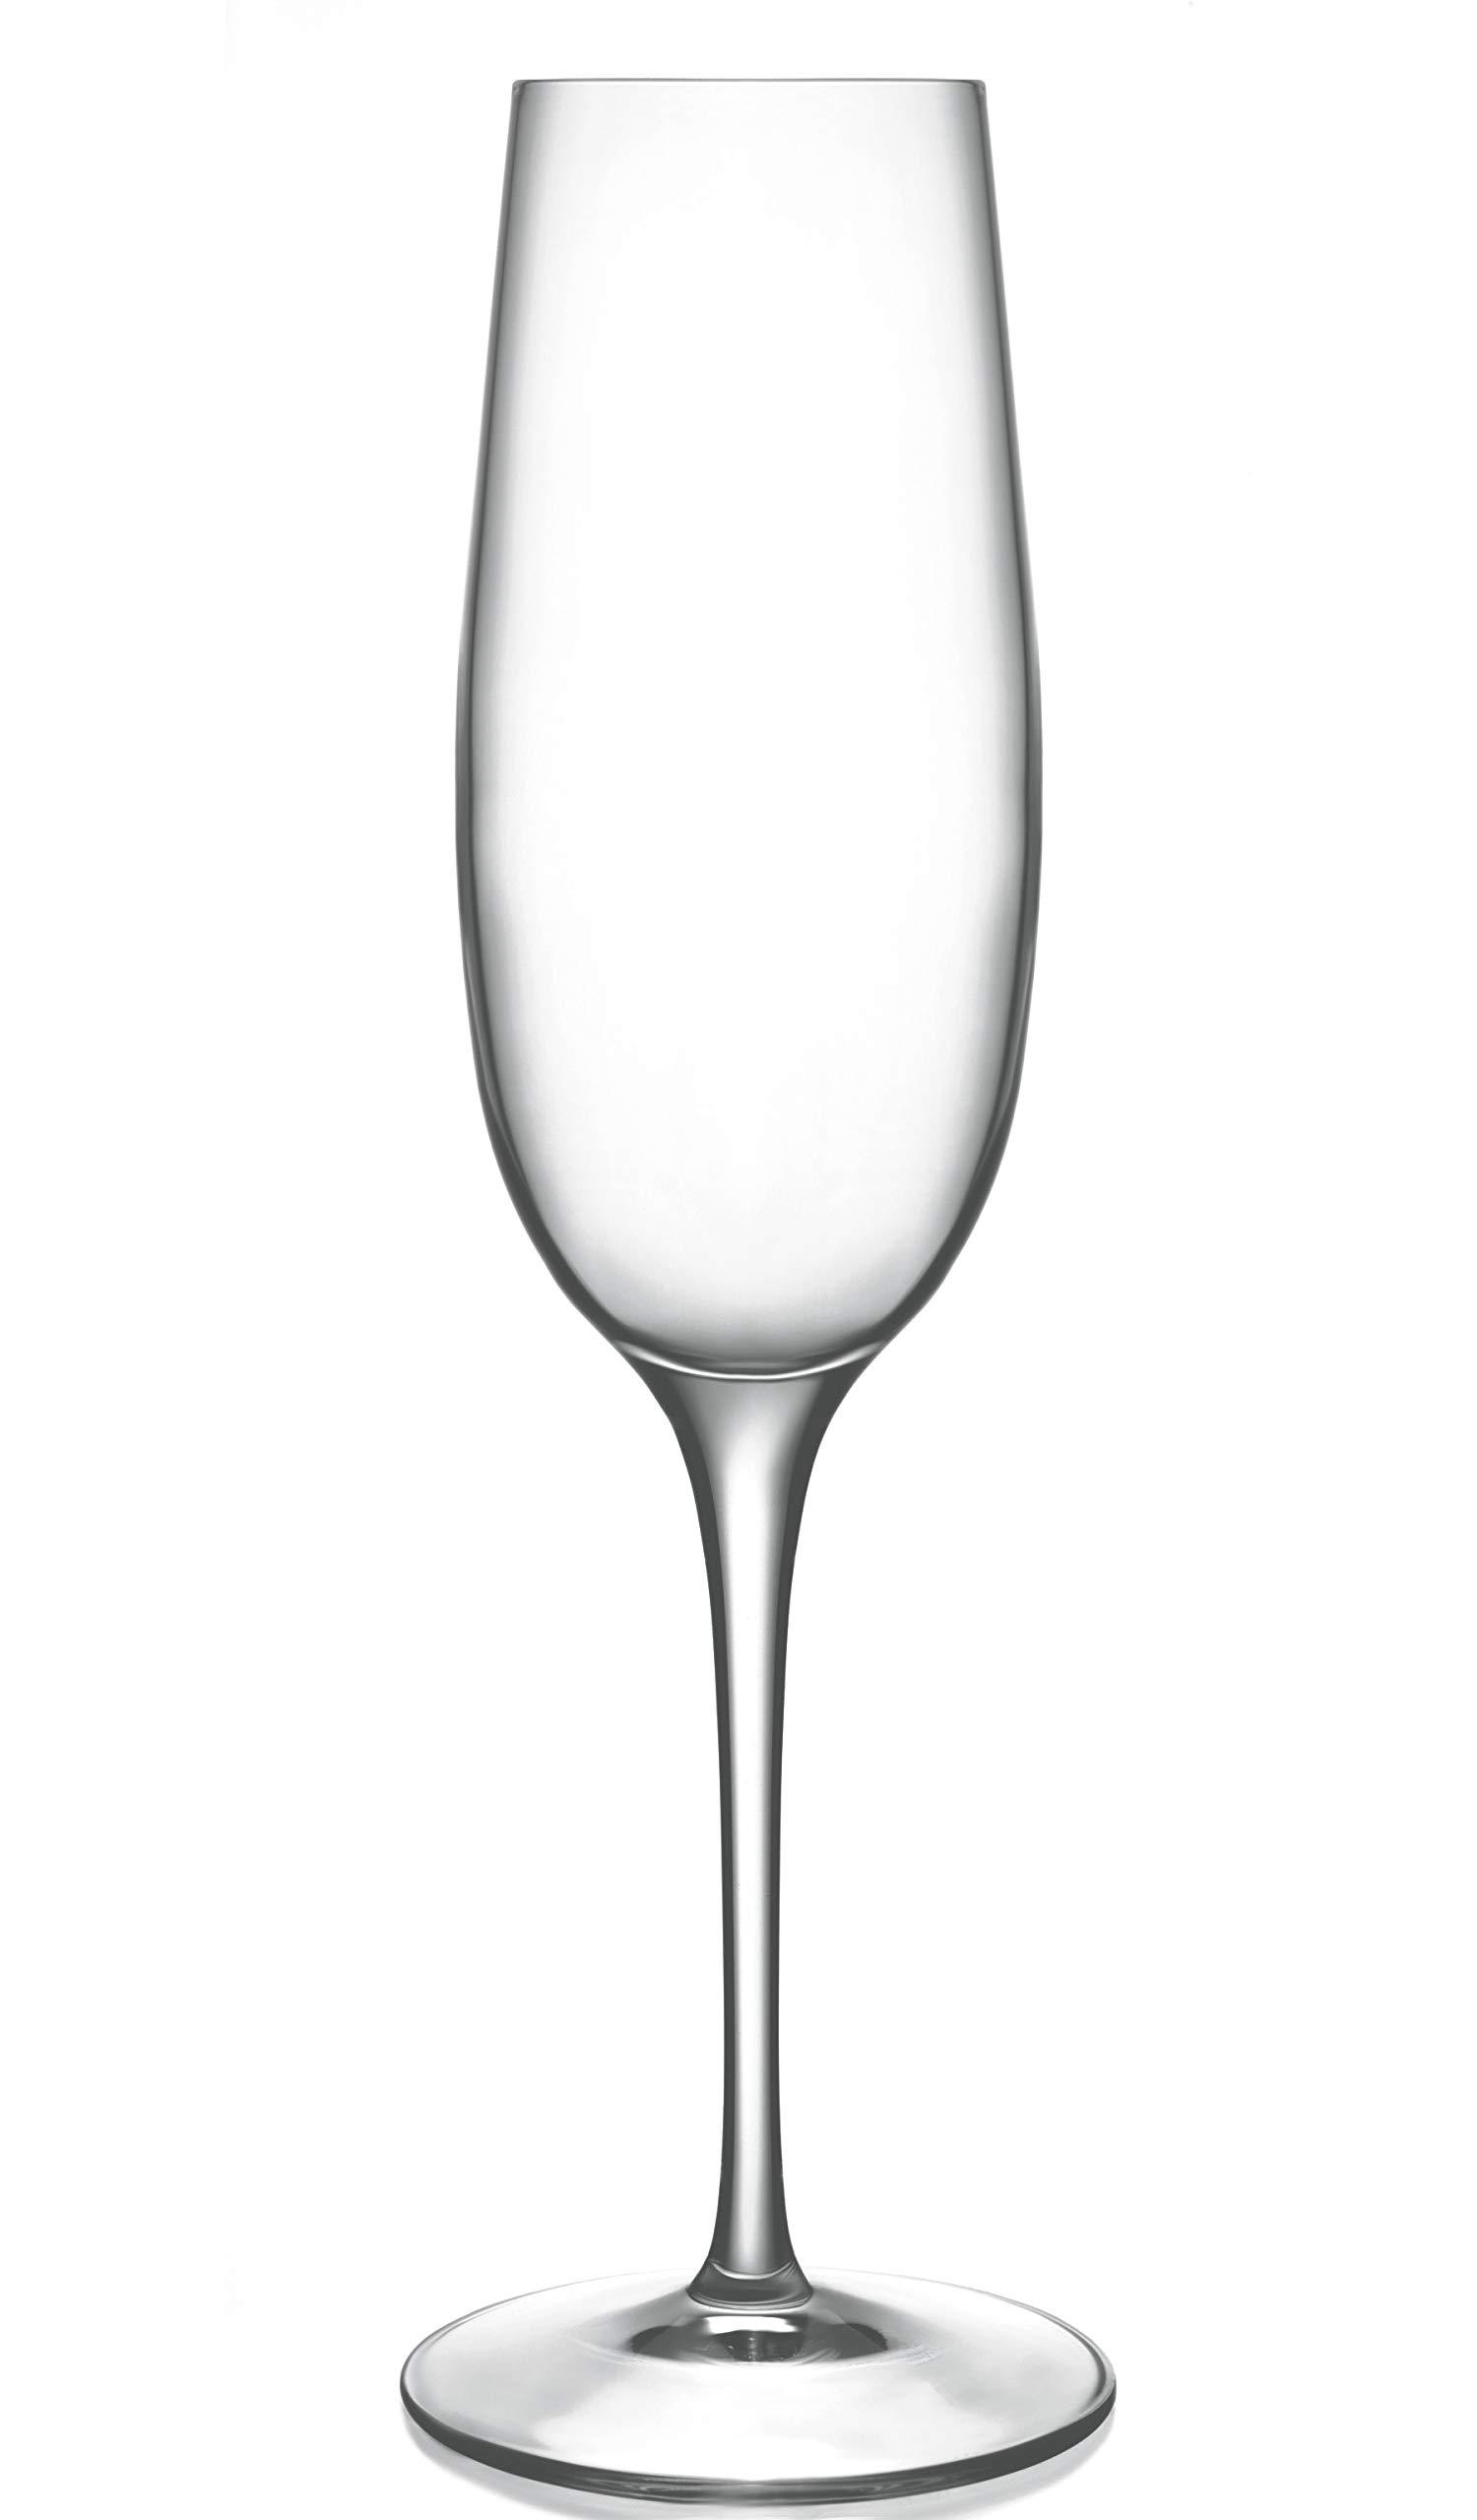 Luigi Bormioli 09233/06 Palace 8 oz Flute Sparkling Wine Glass (Set of 6), Clear